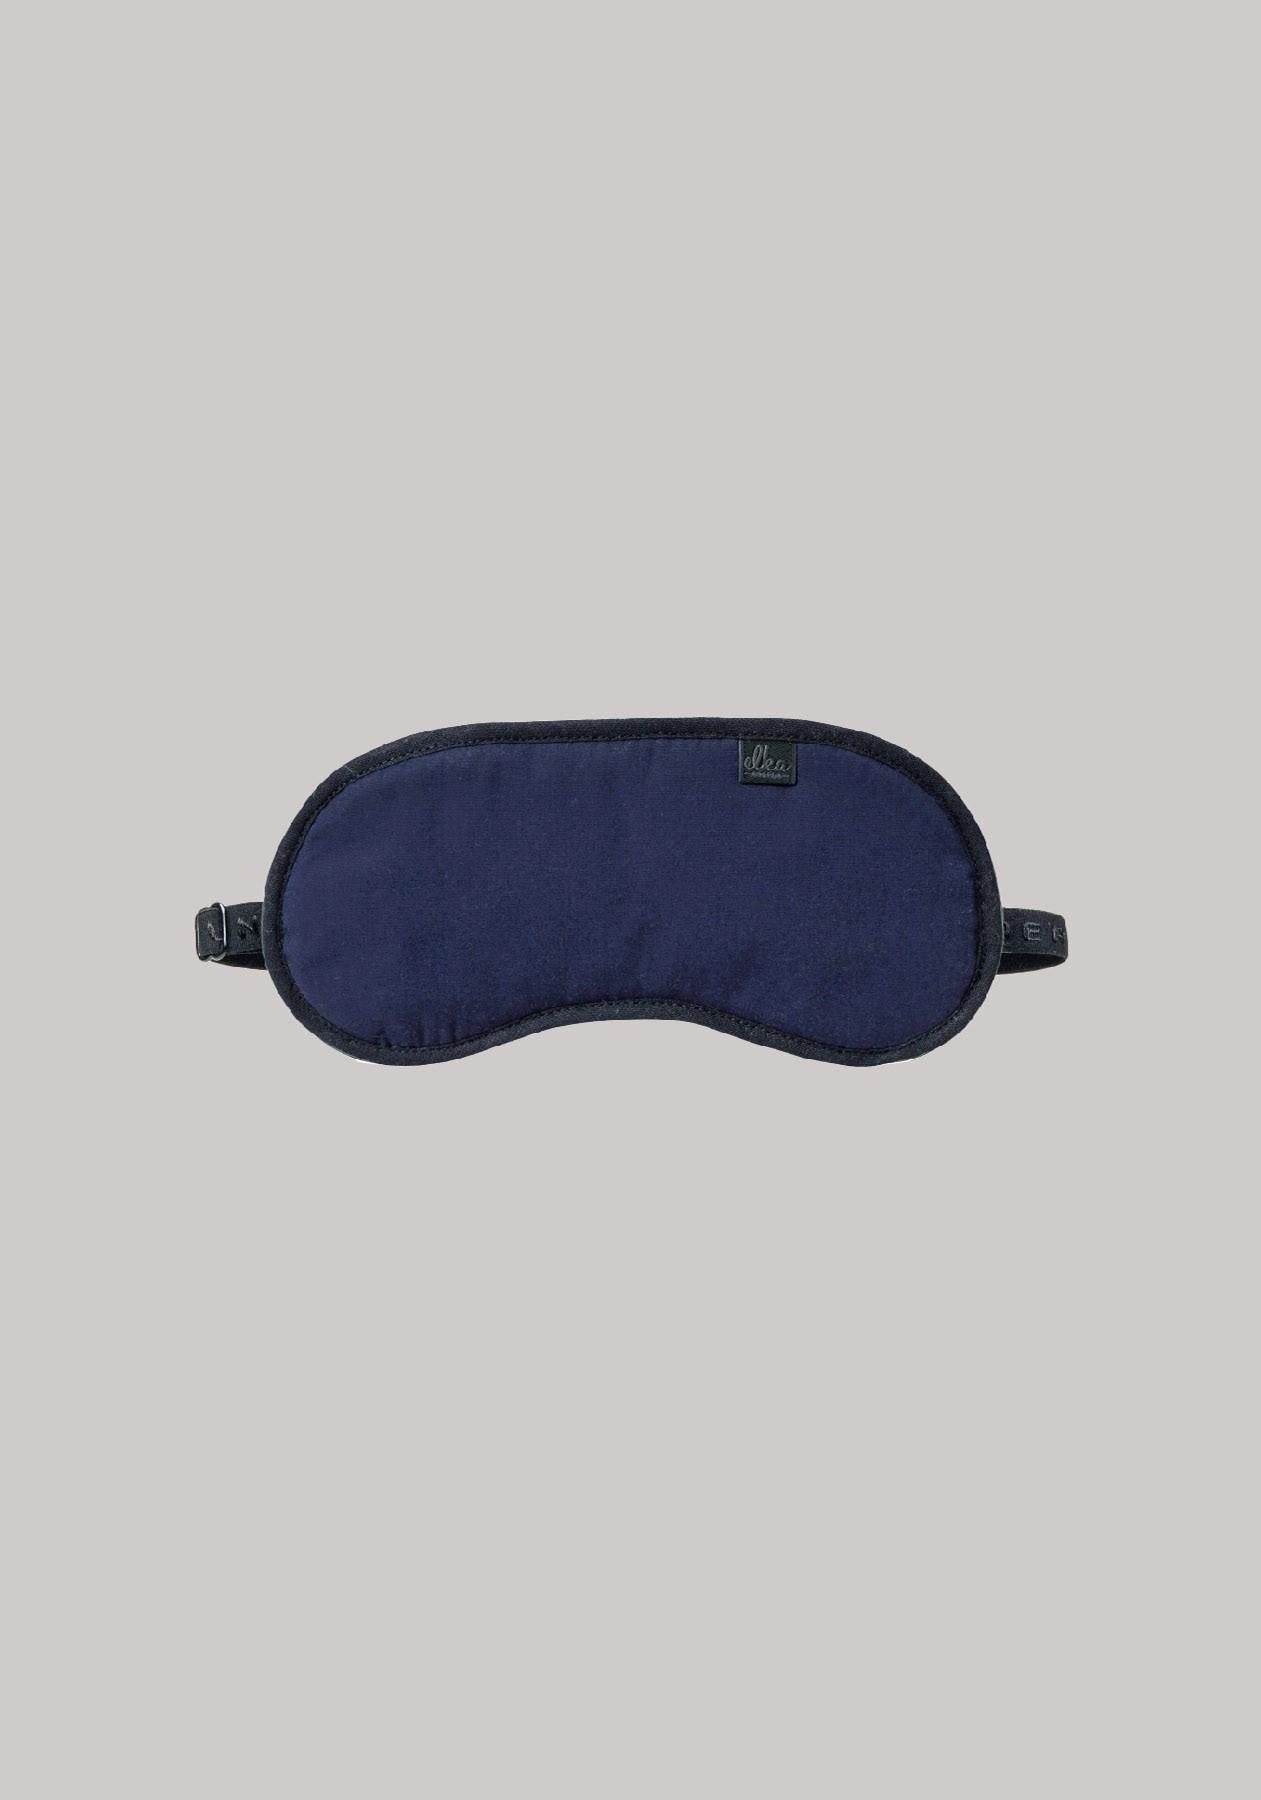 Deco_Home-Sleepmasks-ELKA-Lounge-H00583